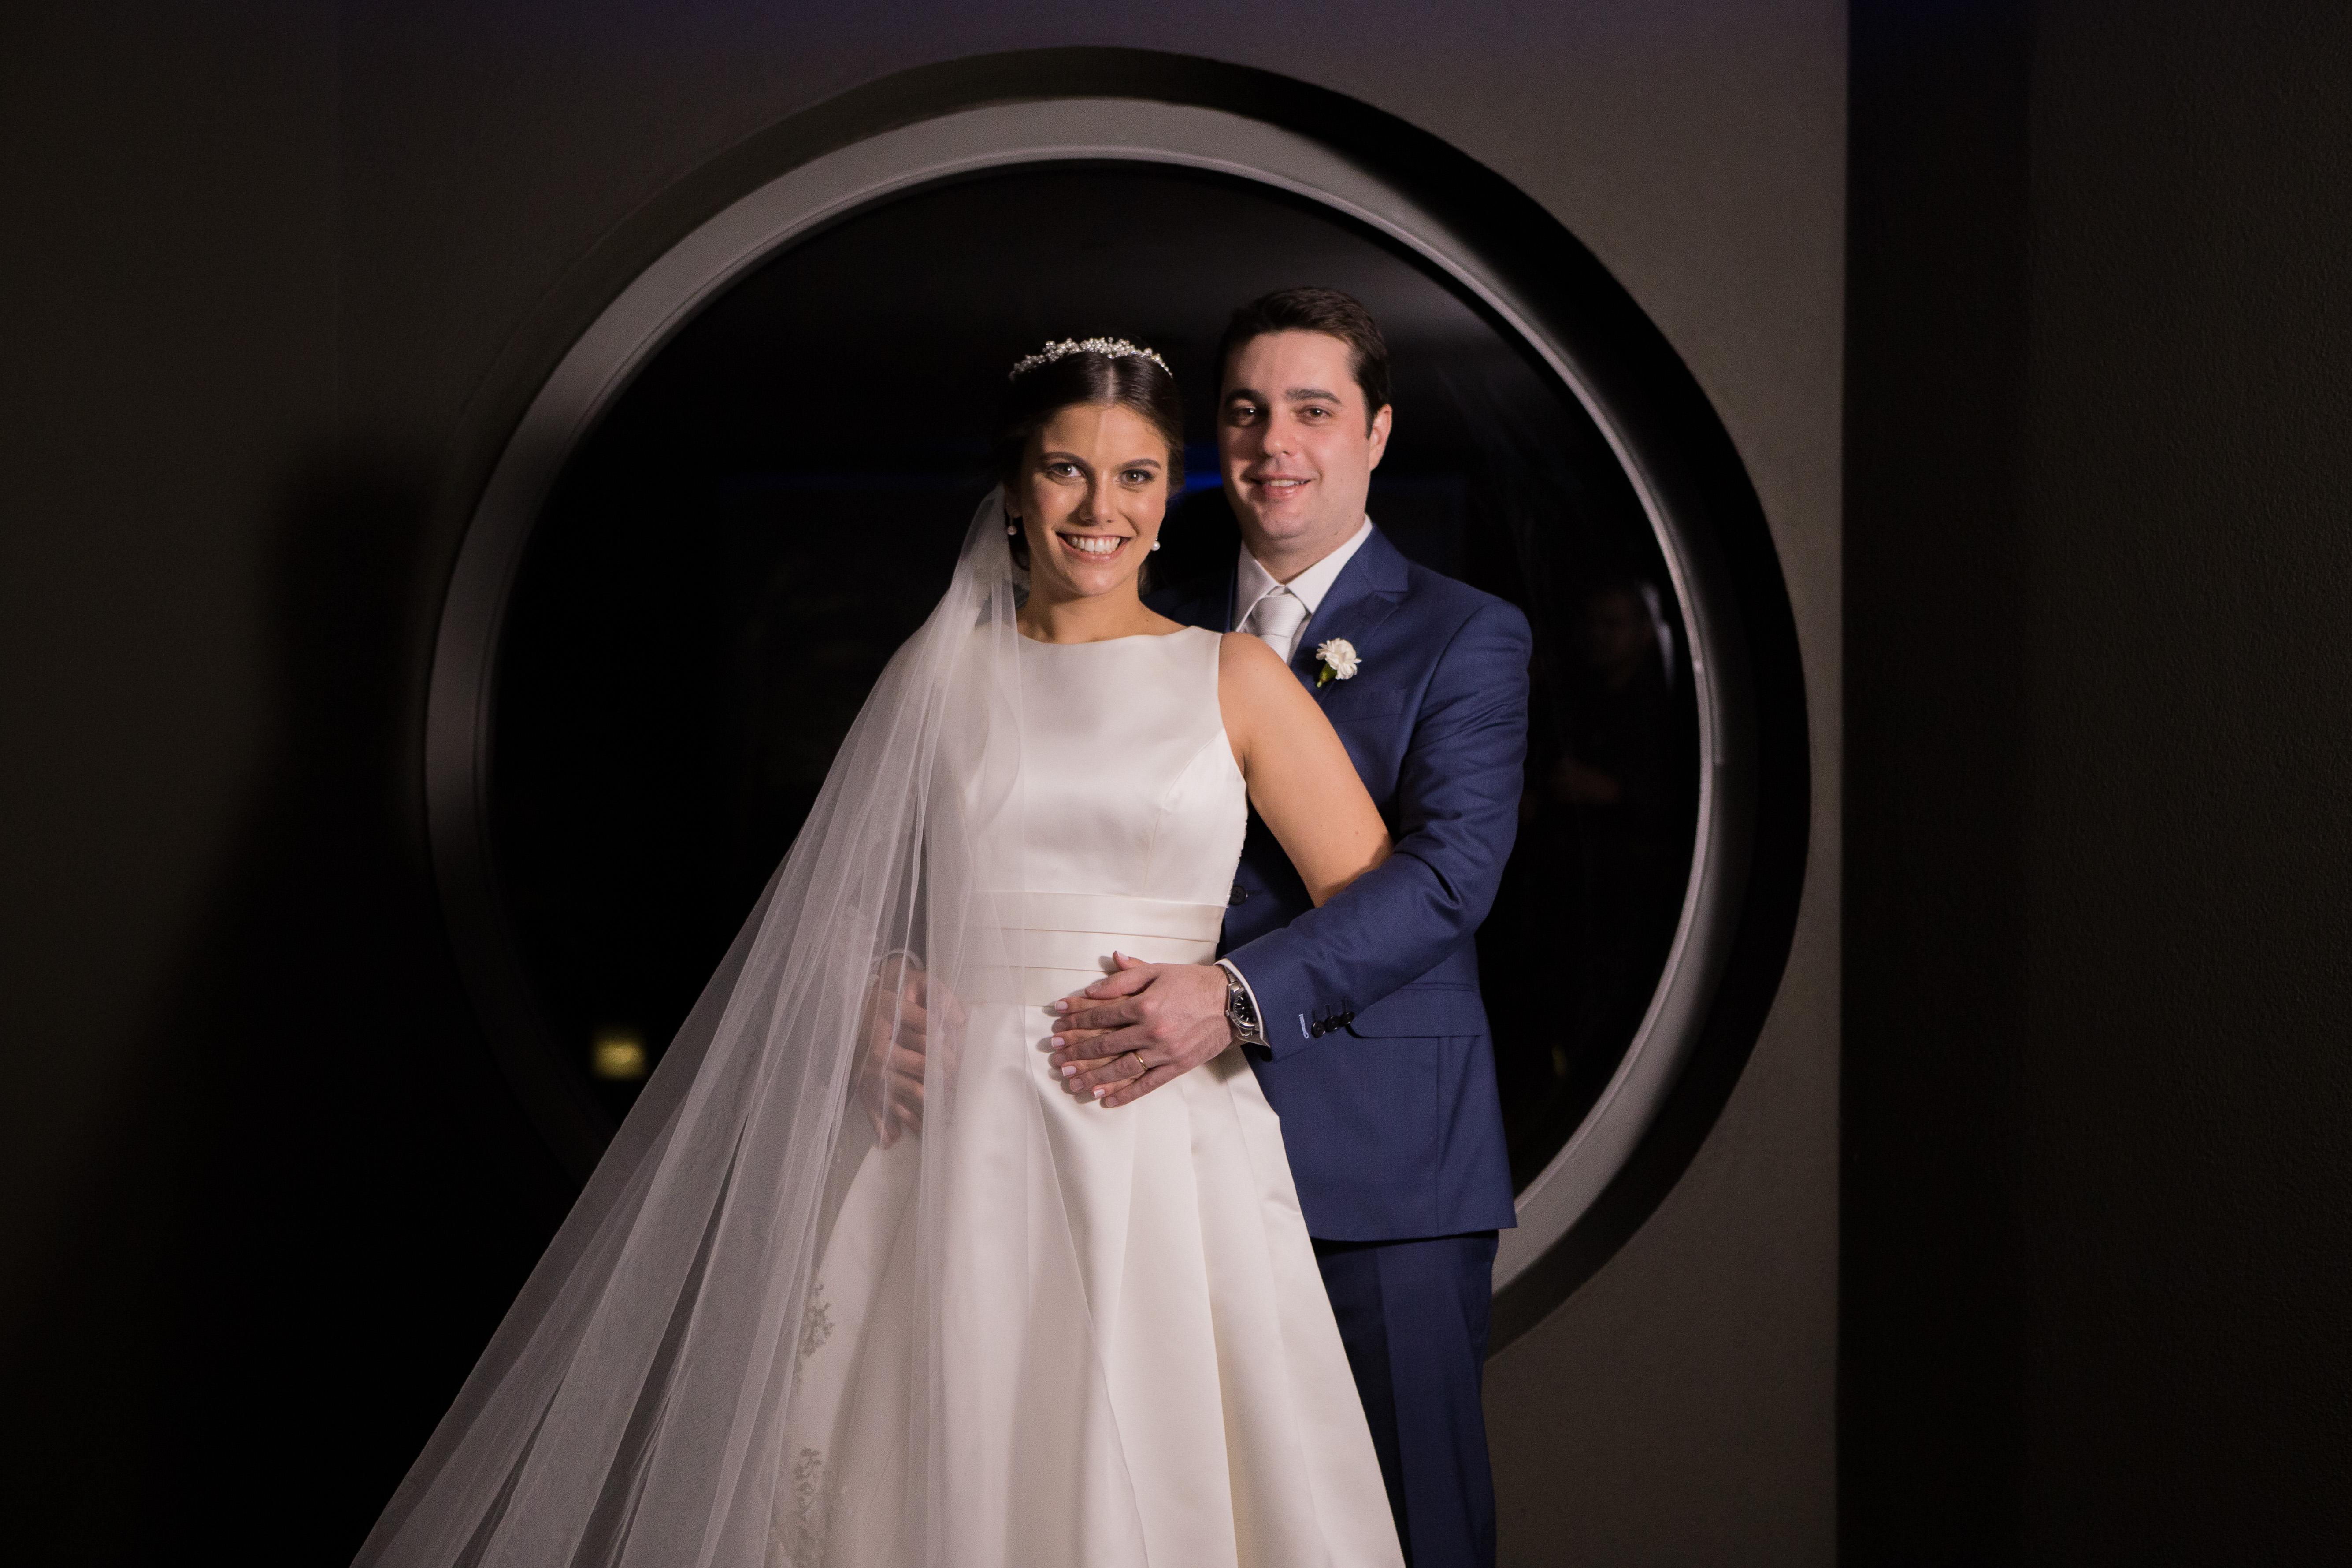 Fotografia de casamento | Carol Noel